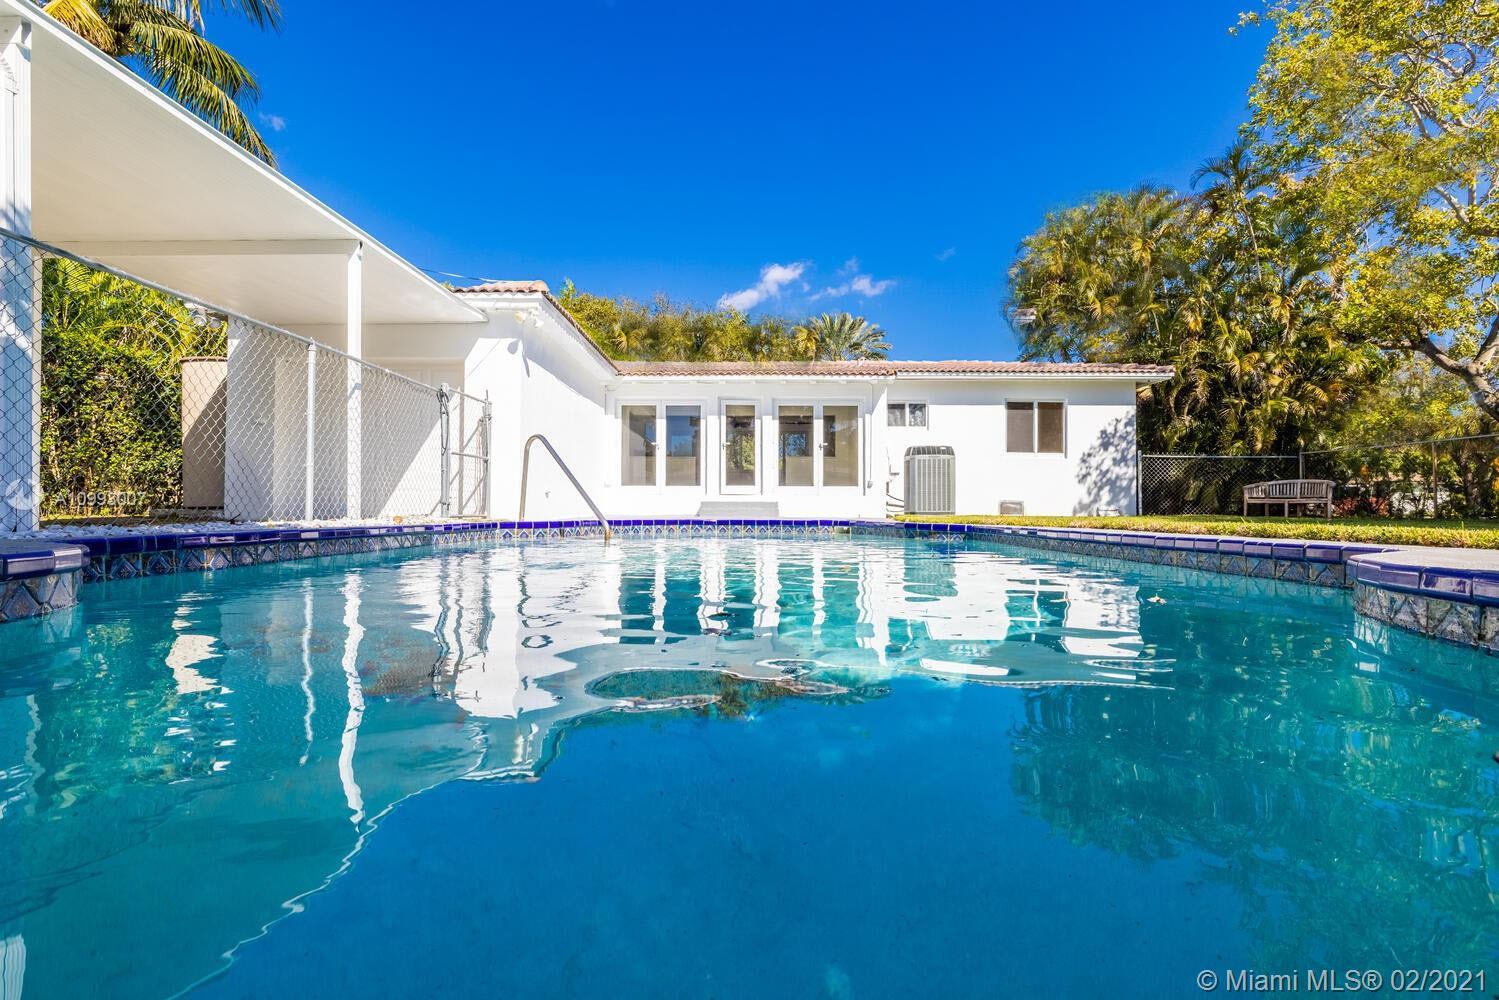 Miami Shores - 2 NW 109 St, Miami Shores, FL 33168